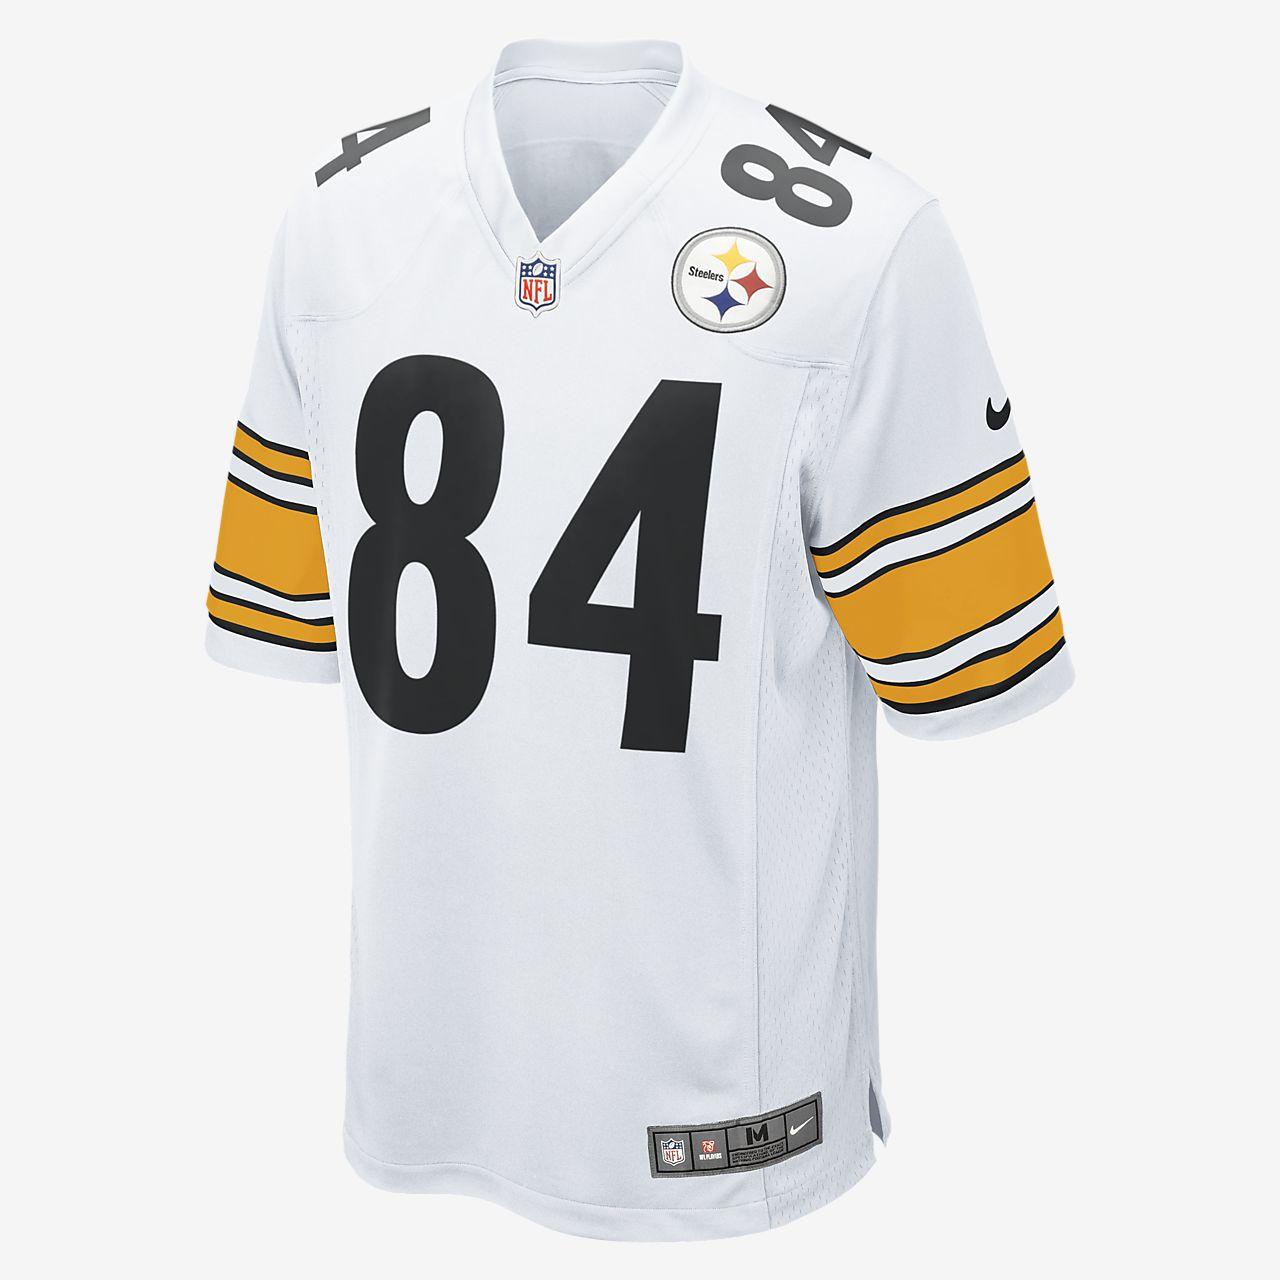 Camisola de jogo de futebol americano NFL Pittsburgh Steelers (Antonio Brown) para homem